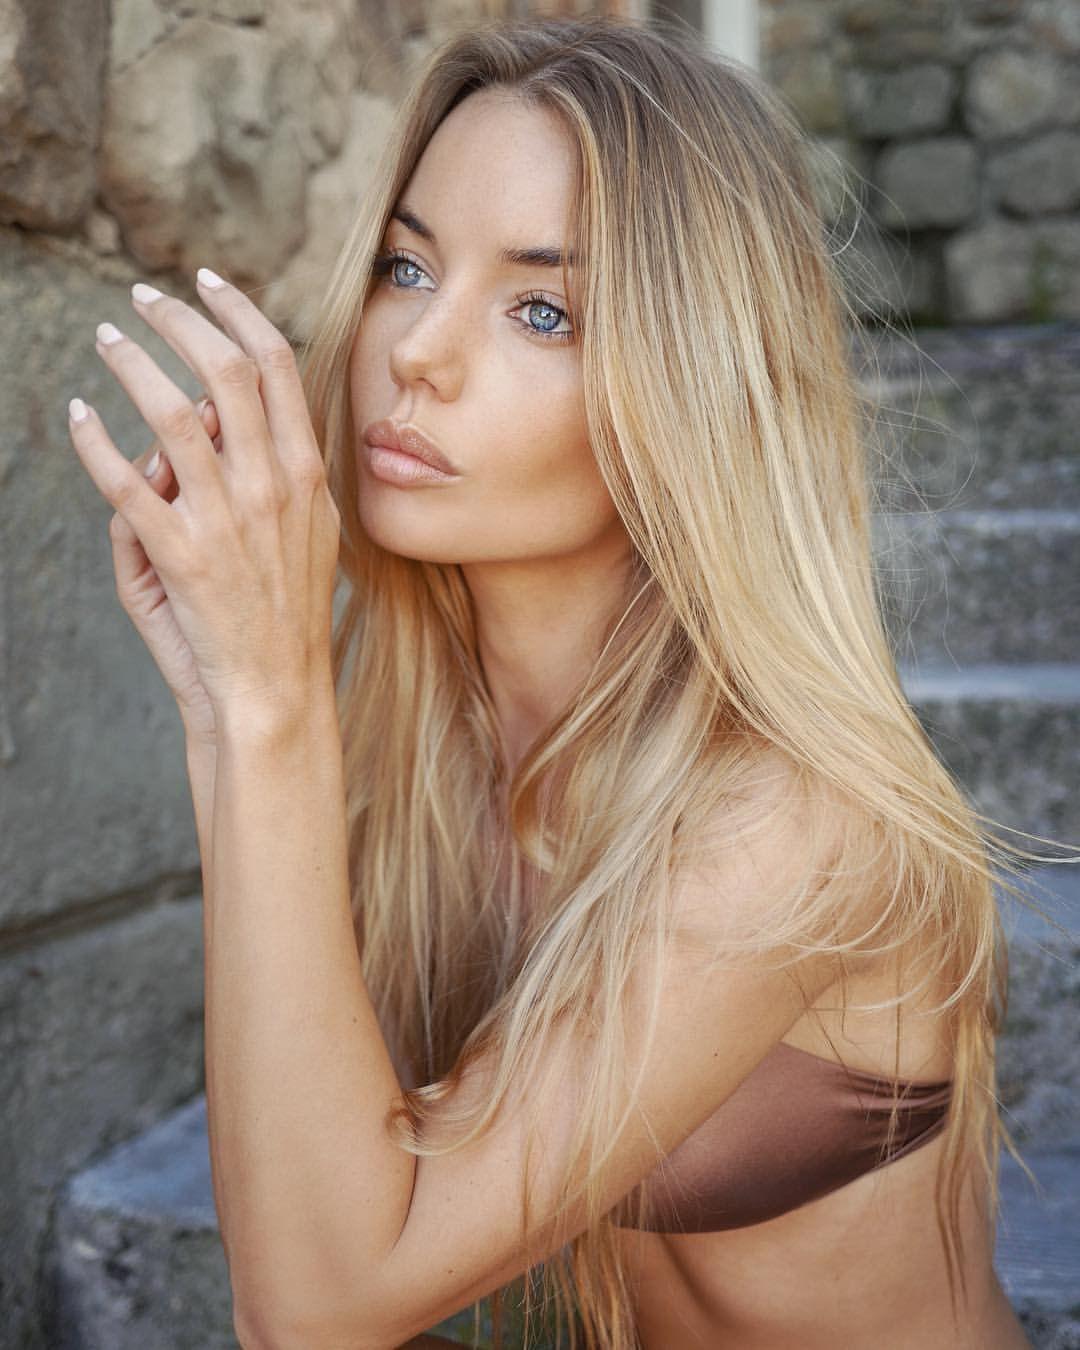 ICloud Anastasia Reshetova nudes (83 foto and video), Sexy, Paparazzi, Twitter, in bikini 2006